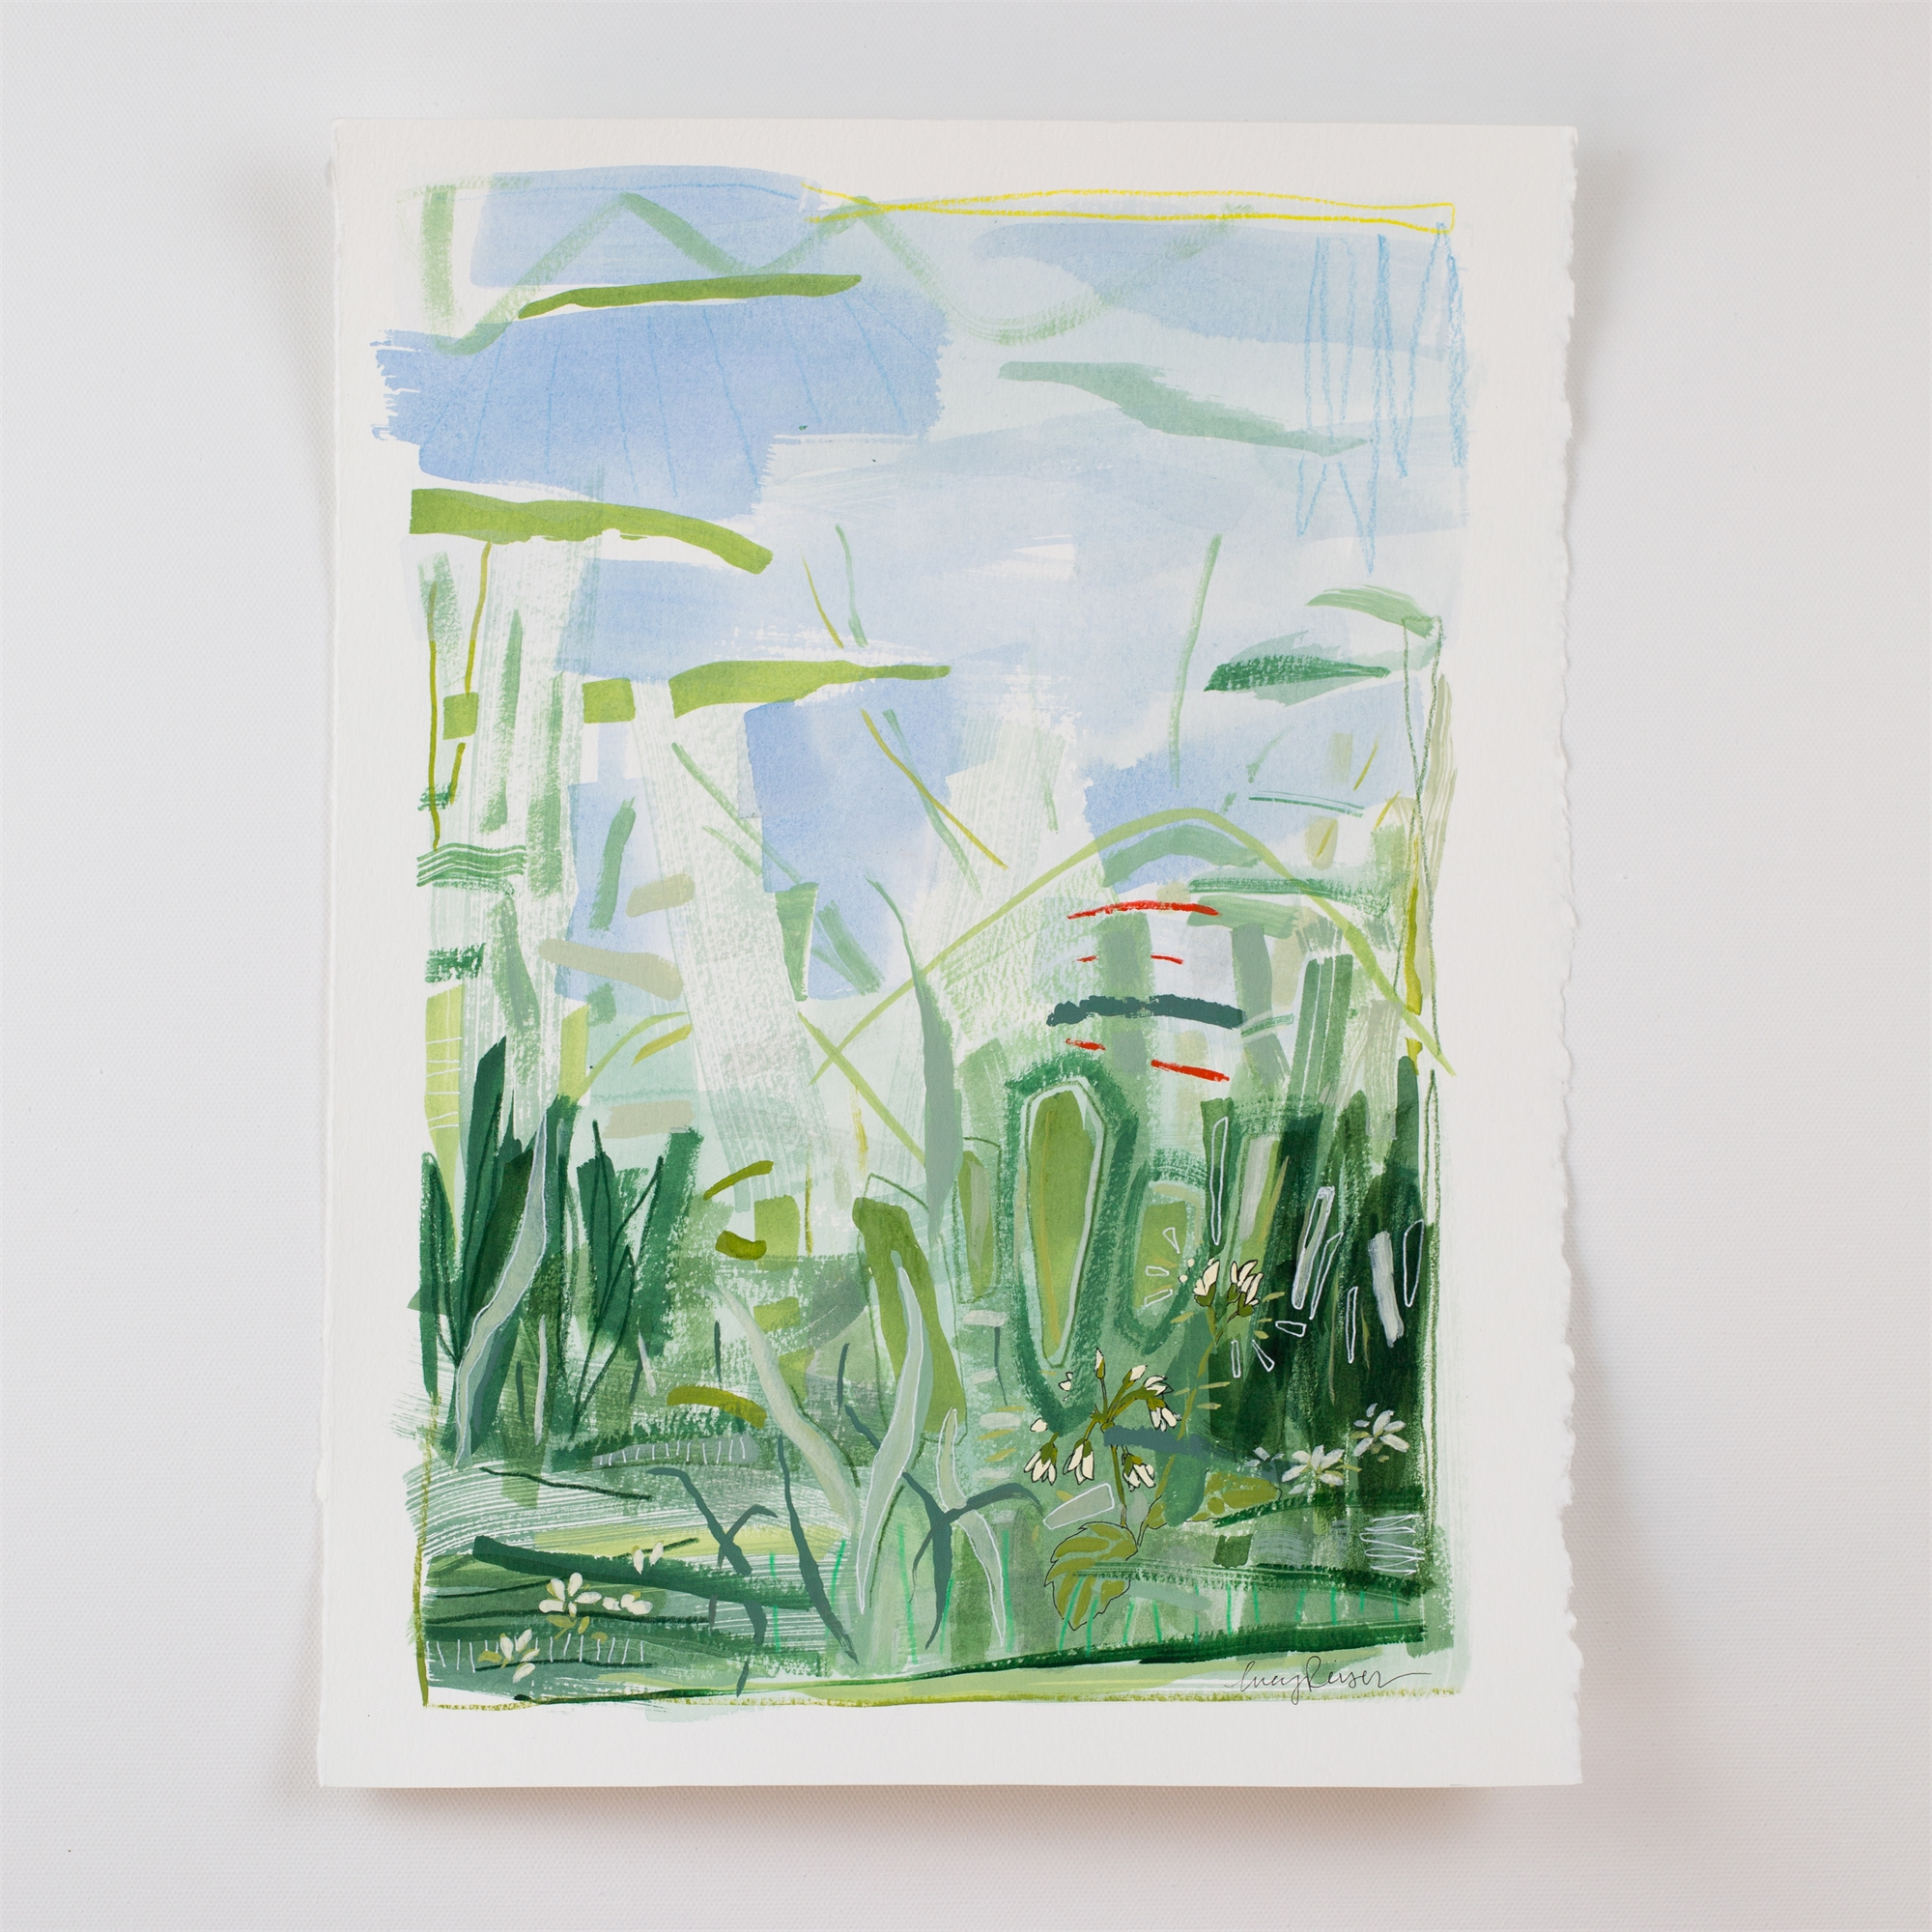 Hatch by Lucy Reiser